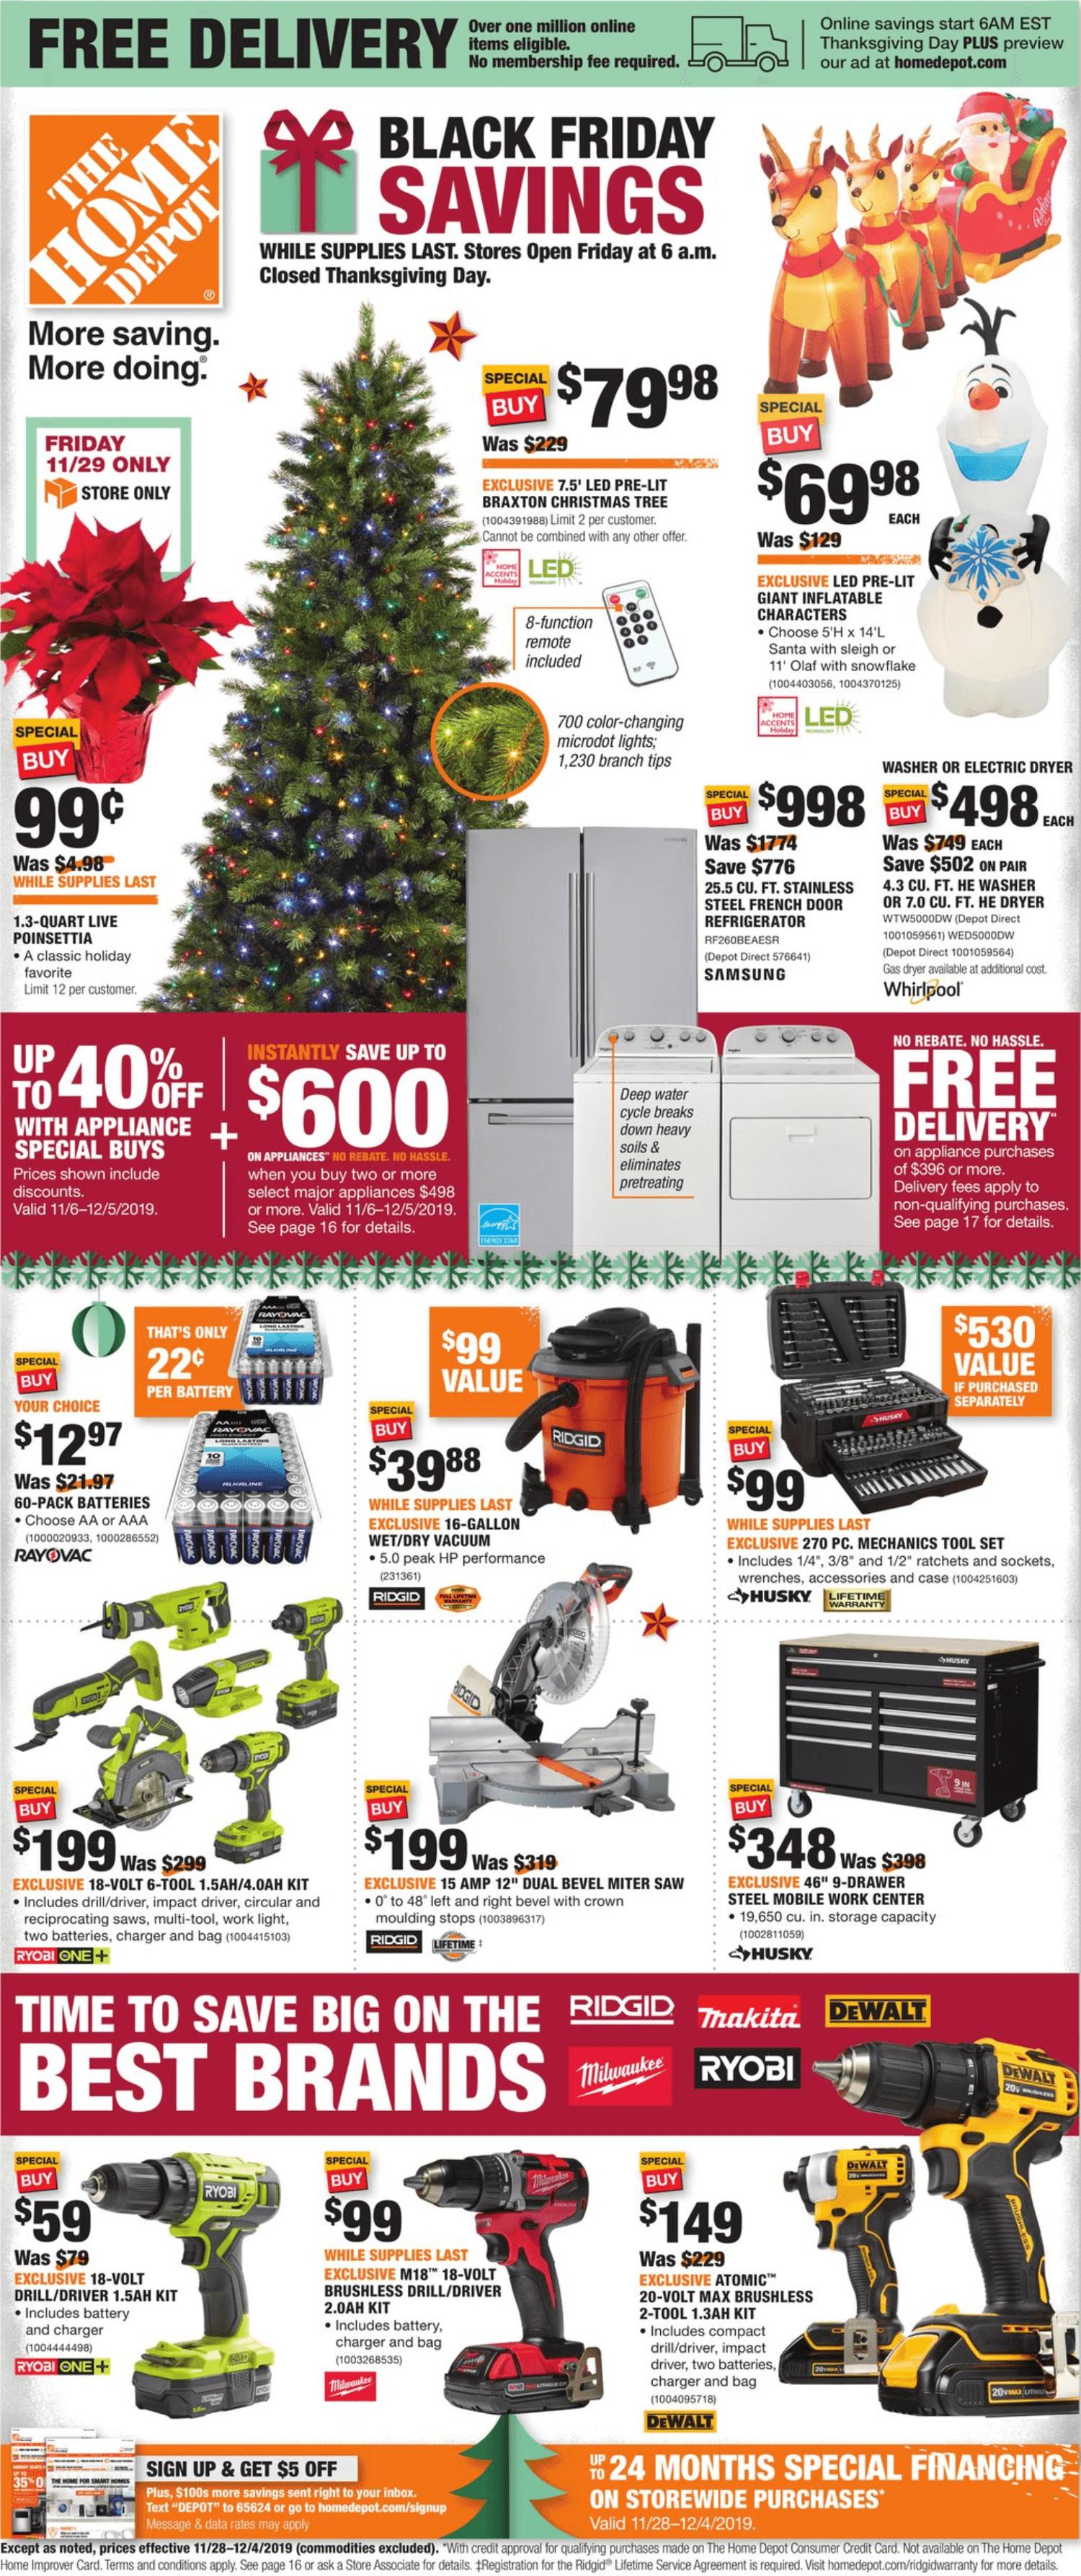 Black Friday 2020 Best Deals Today Page 5 Work Money Fun Home Depot Black Friday Ads Black Friday Hours